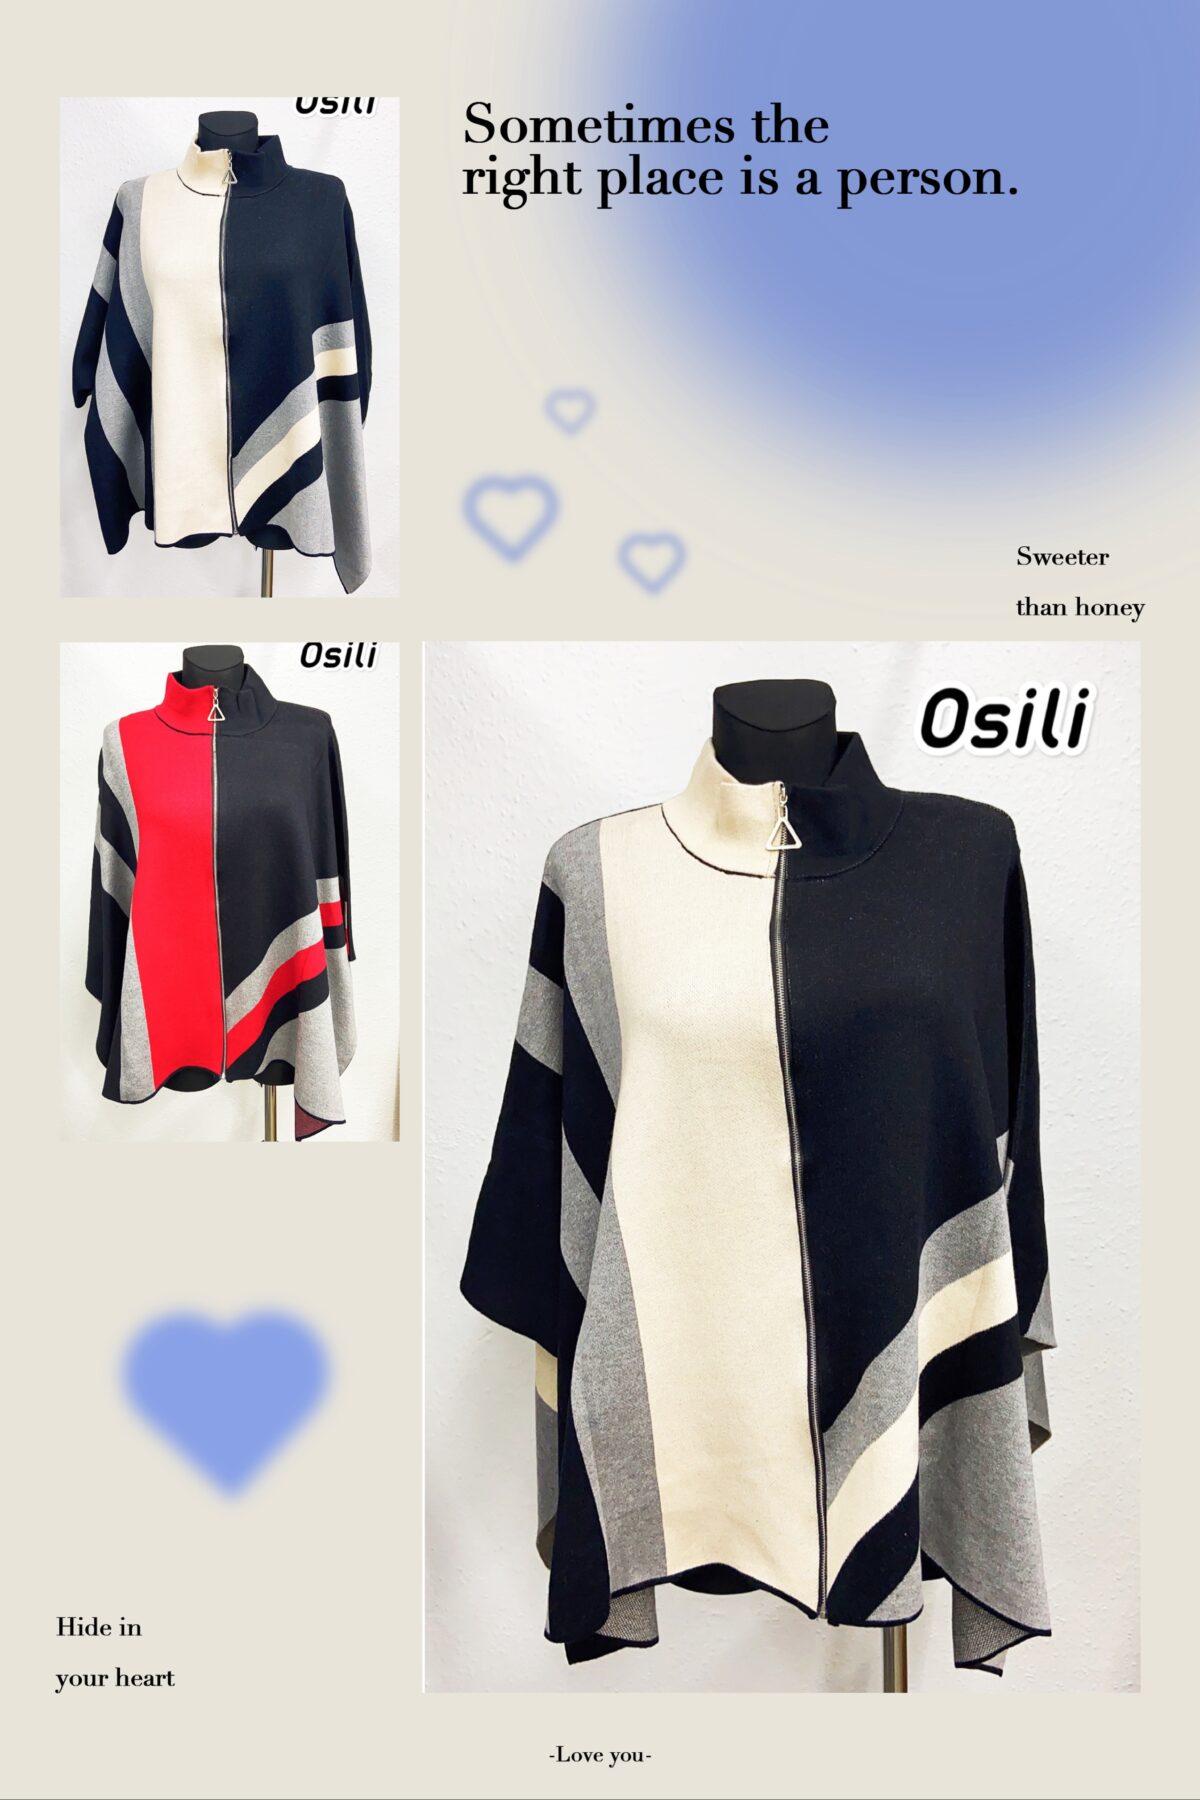 C0447F04 C5DE 439B B776 4F1F78D5FC49 scaled Osili - Fashion - Divat